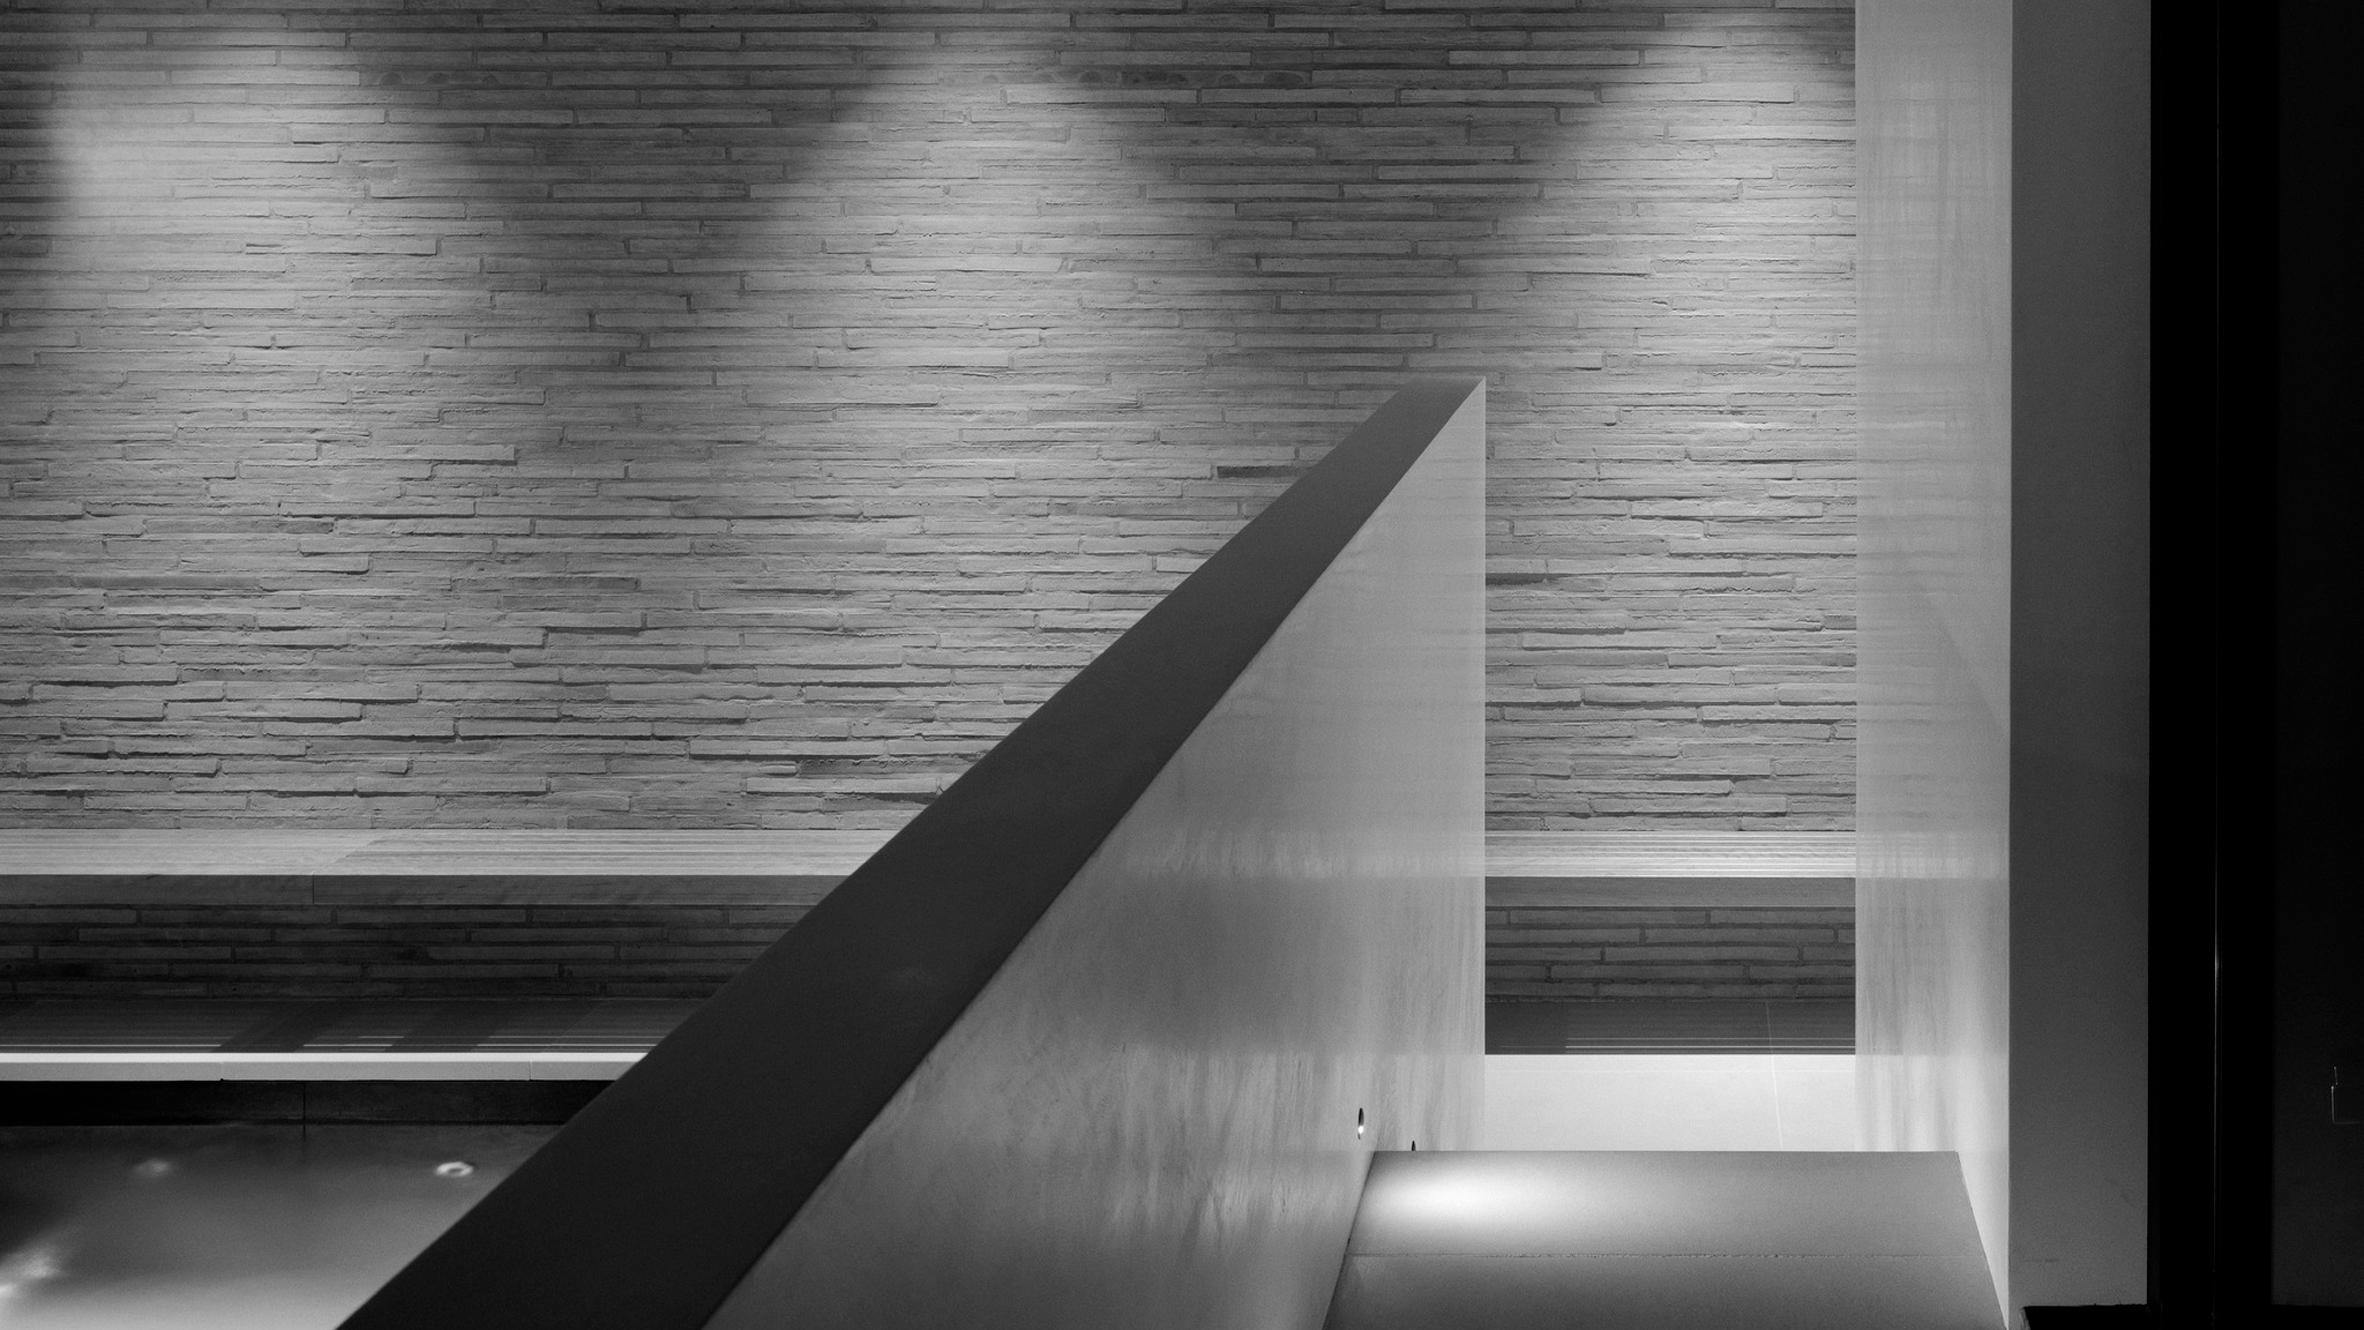 London Spa, London, UK, by Richard Bell Architecture